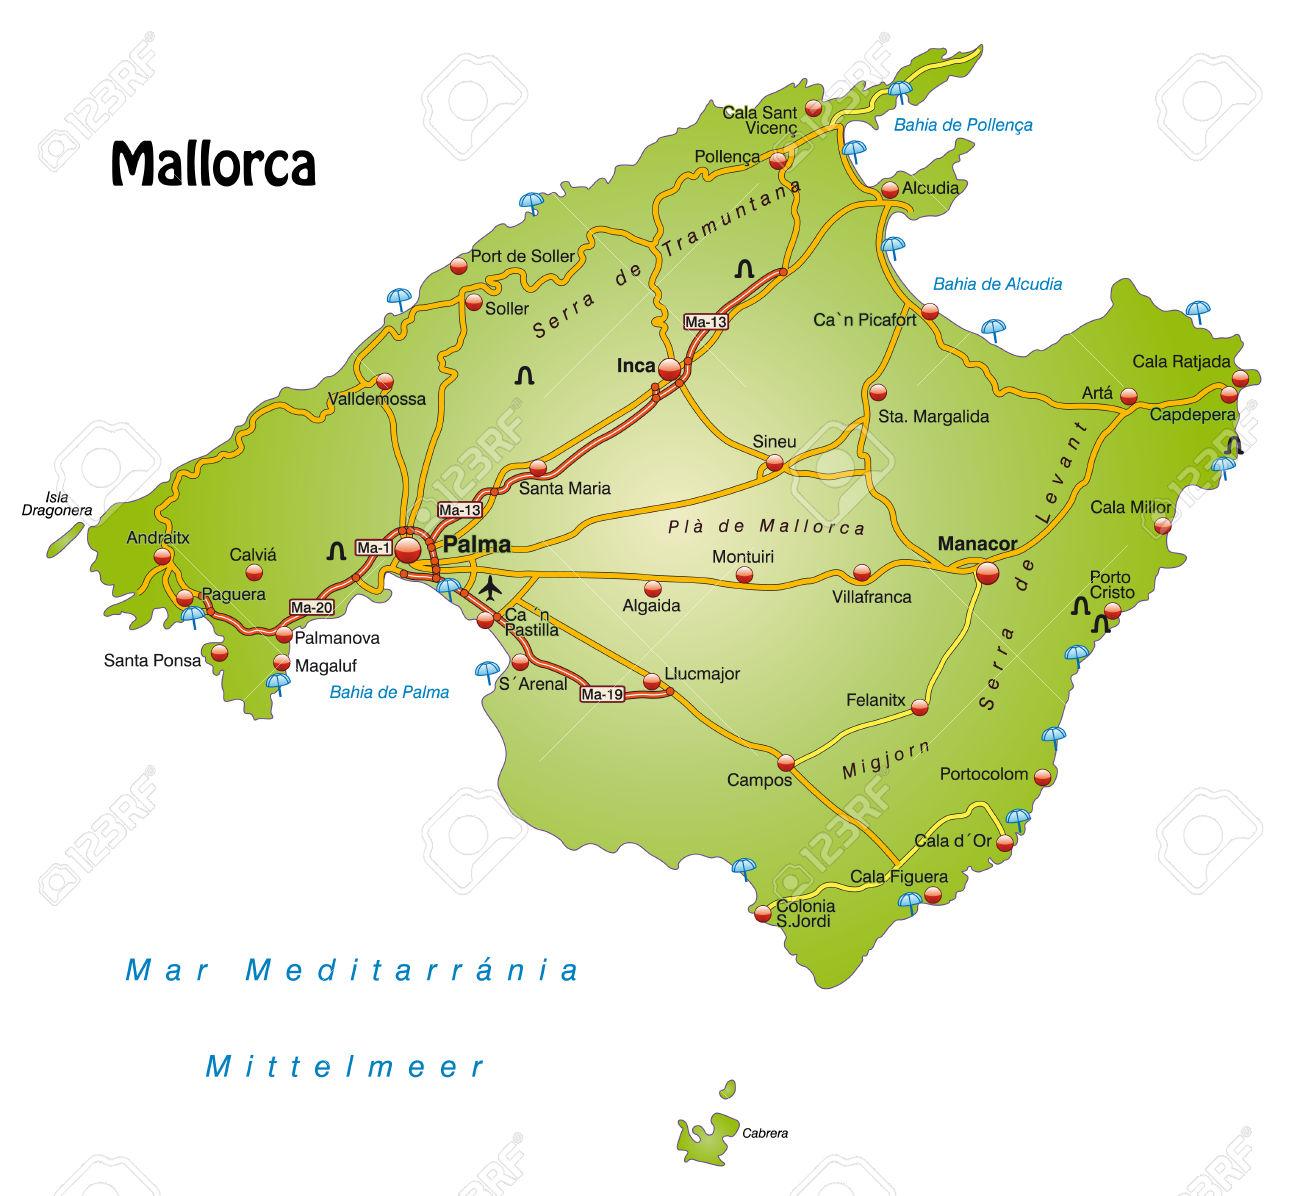 Mappa Di Maiorca Con Autostrade Clipart Royalty.